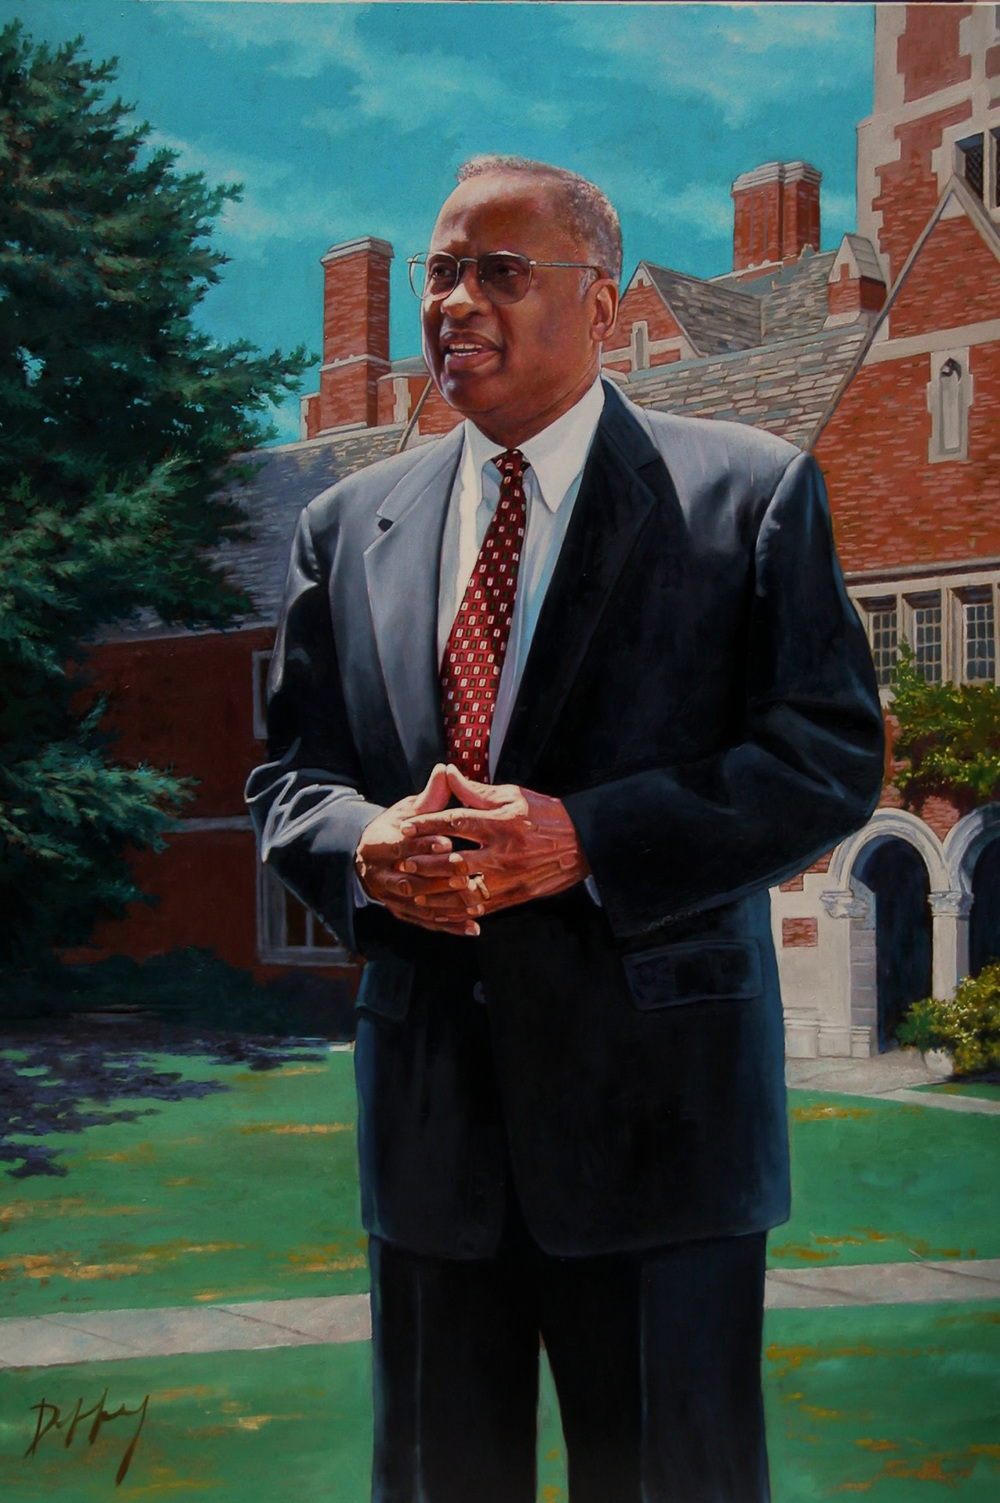 14-James-Thomas-Yale-Law-School-44x60-112x153cm.jpg